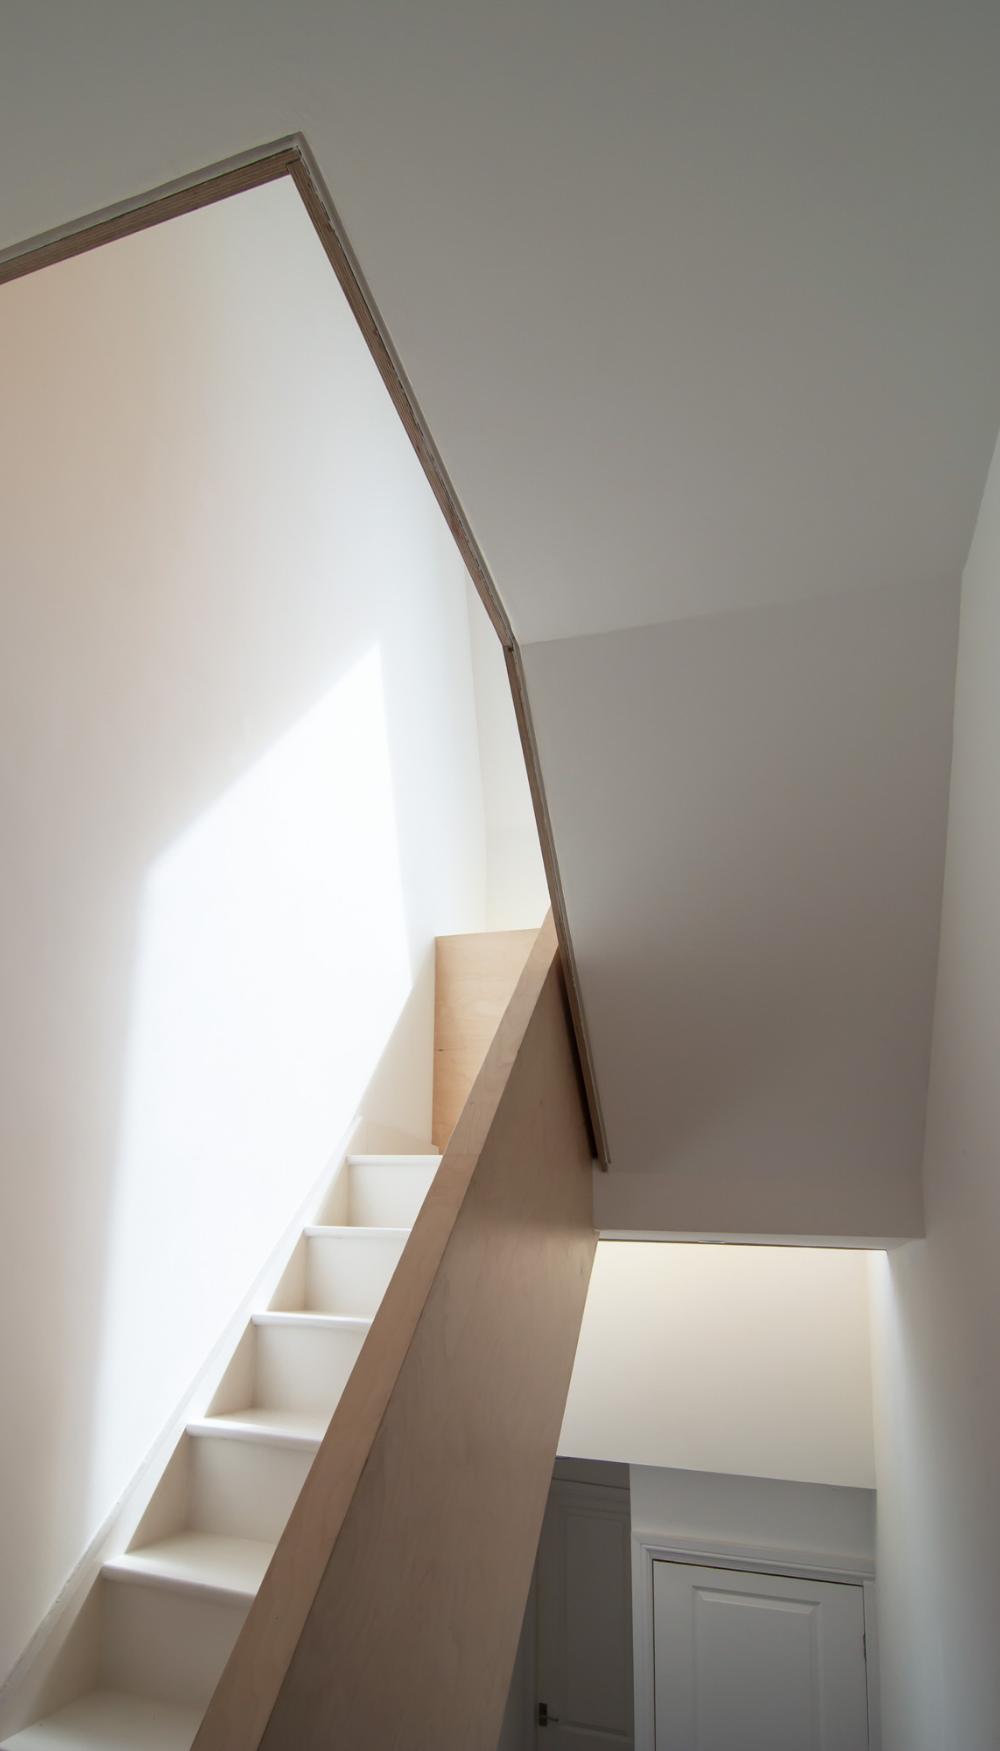 Bespoke Stair Plywood Balustrade Loft Stair Loft Conversion Stoke ...